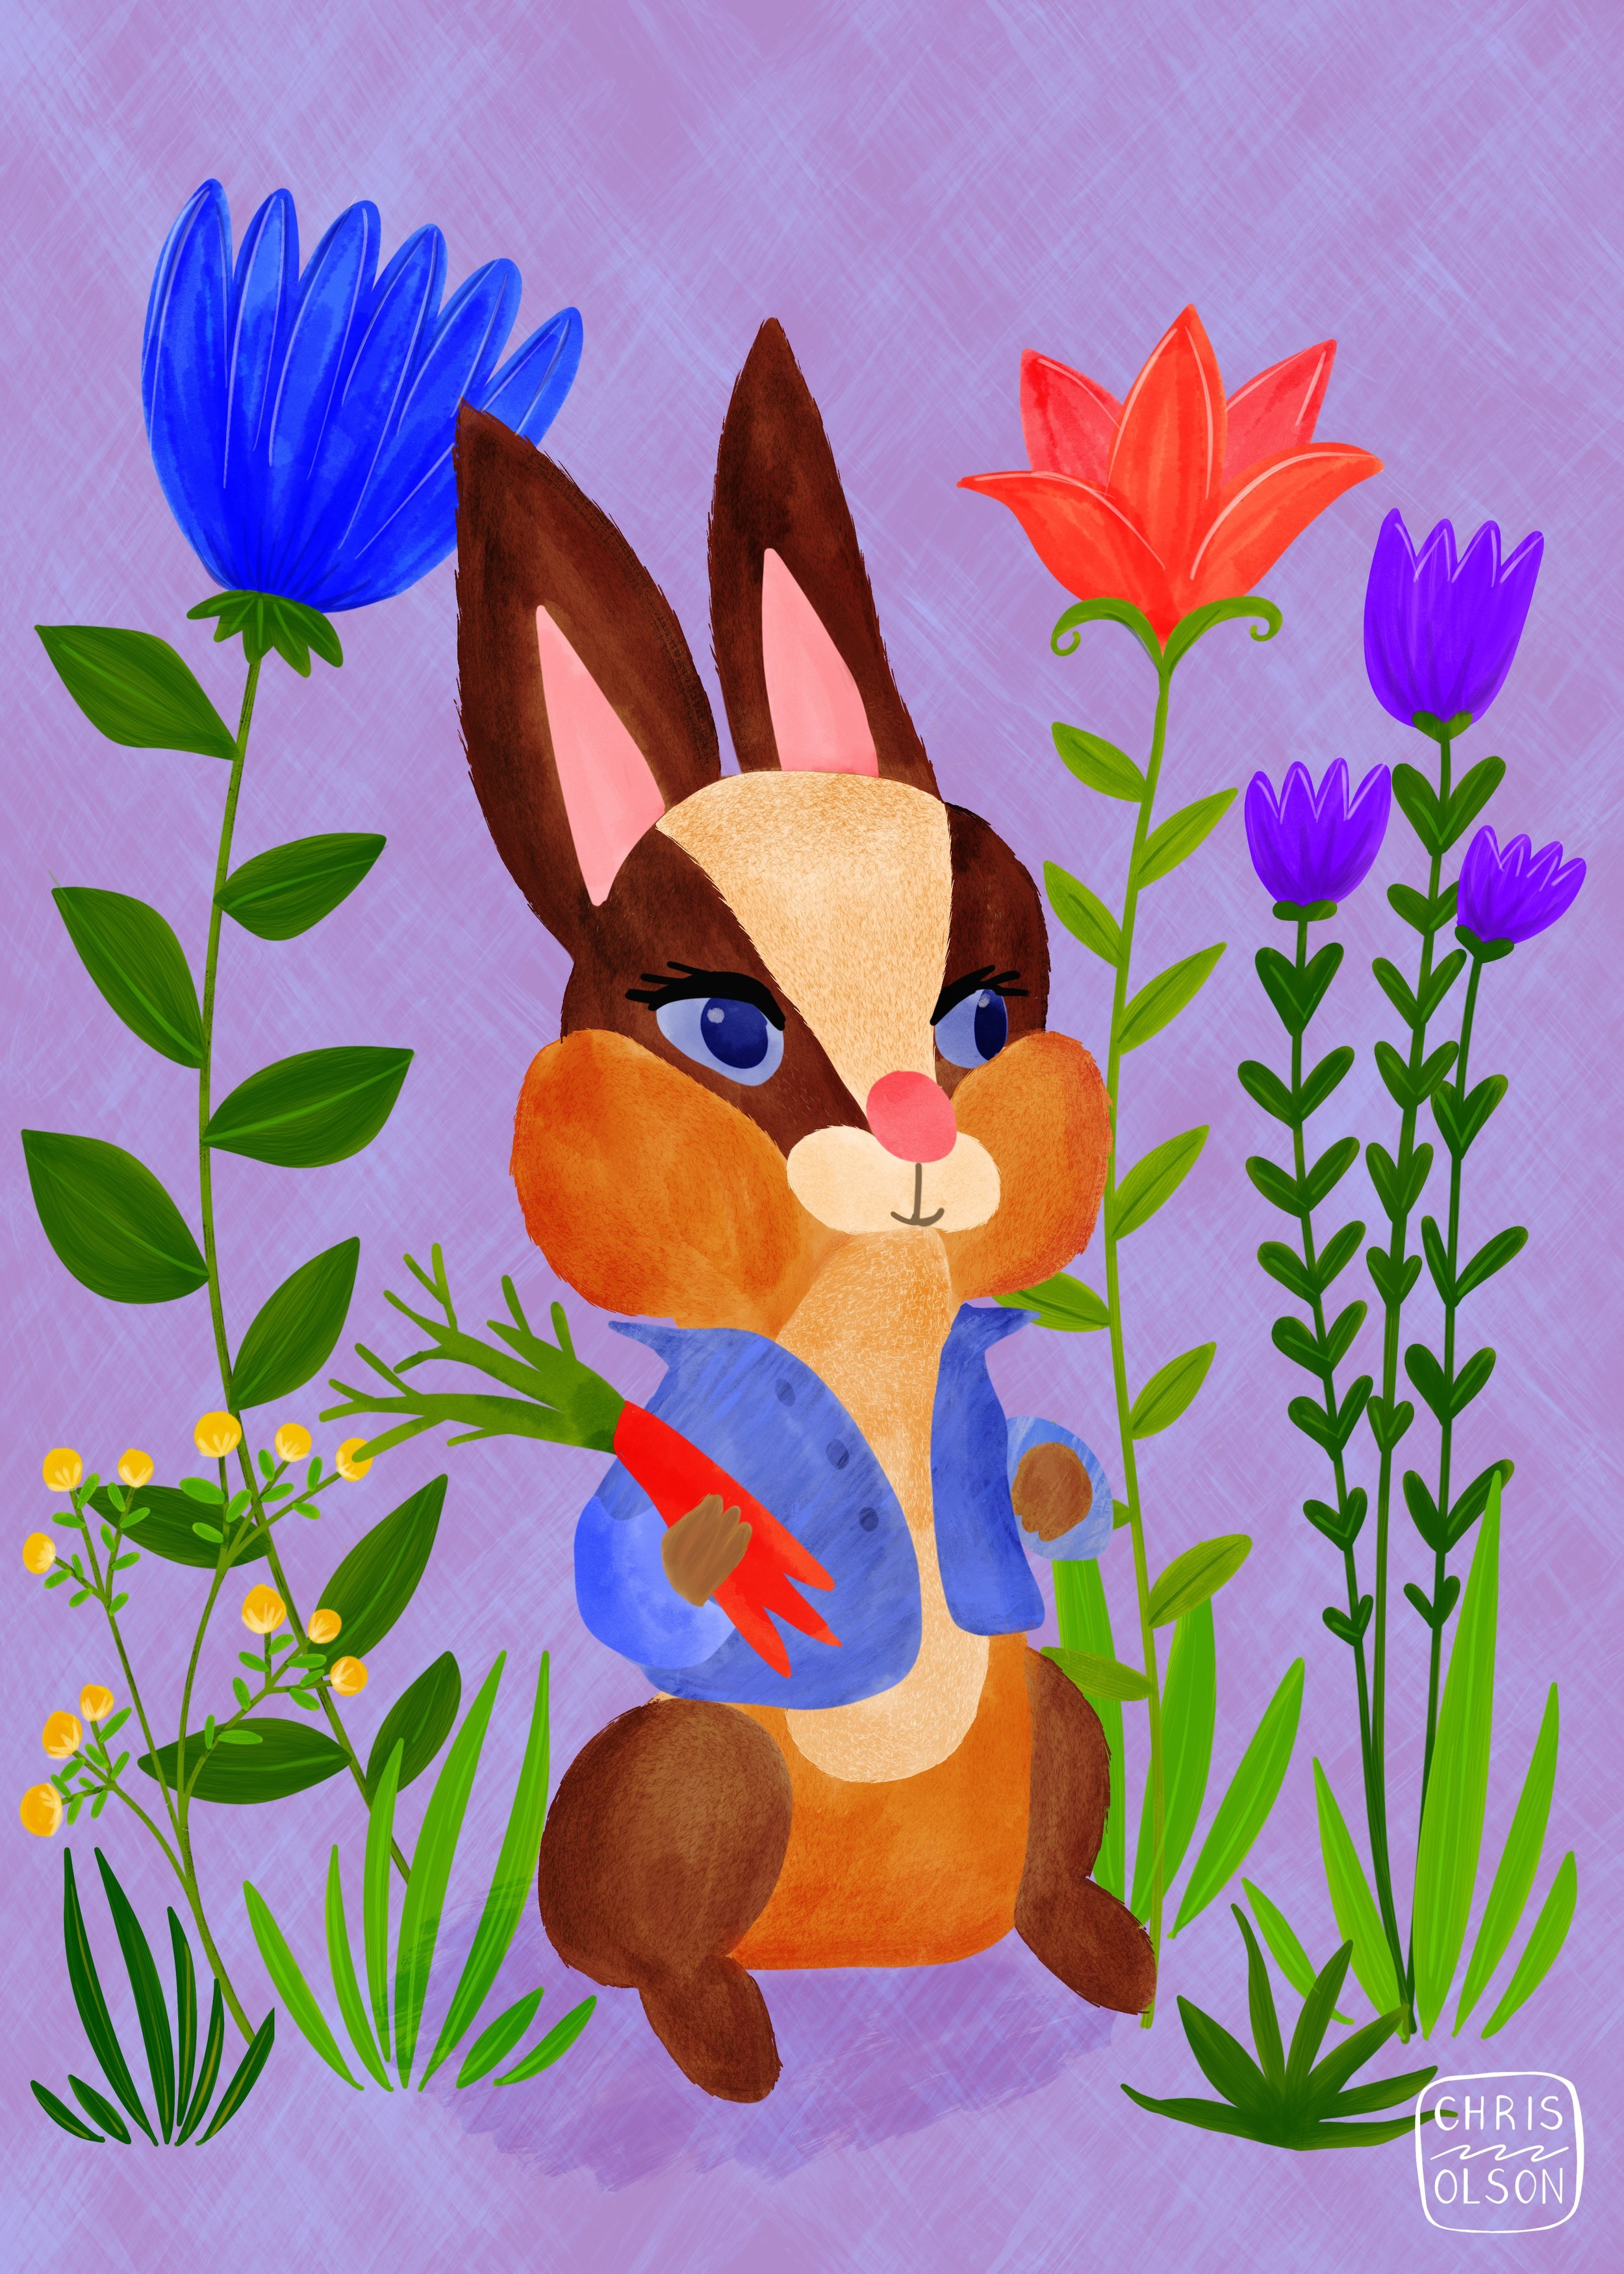 Rabbit illustration by Chris Olson